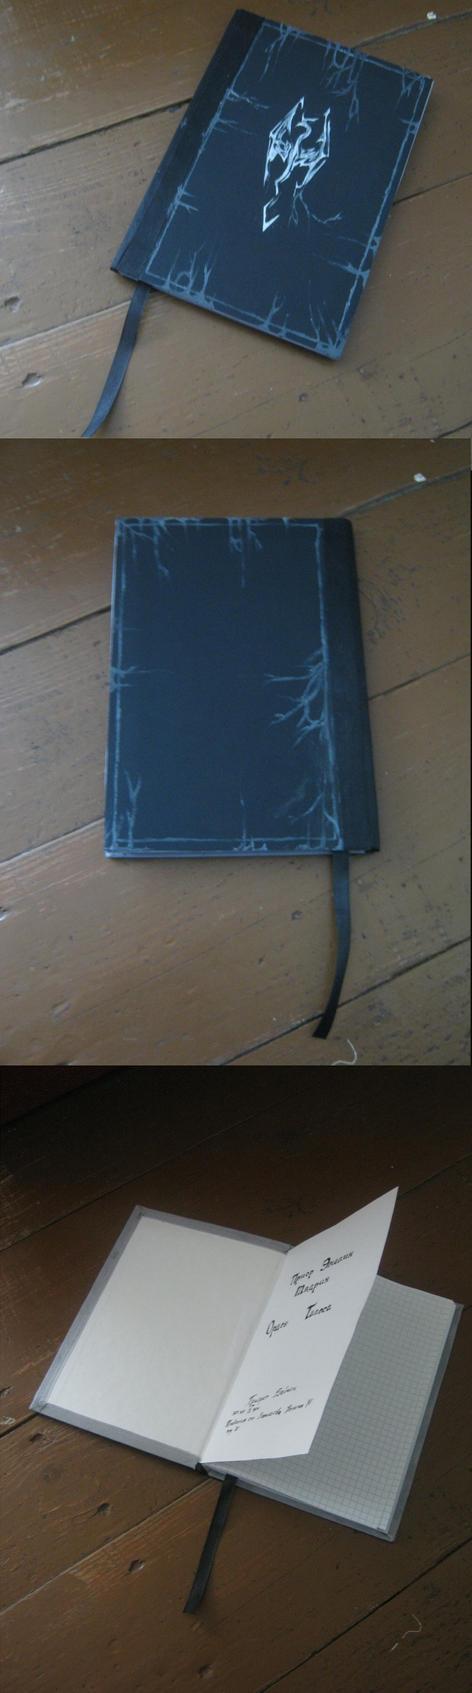 Skyrim - Handmade Notebook by KlodwigLichtherz